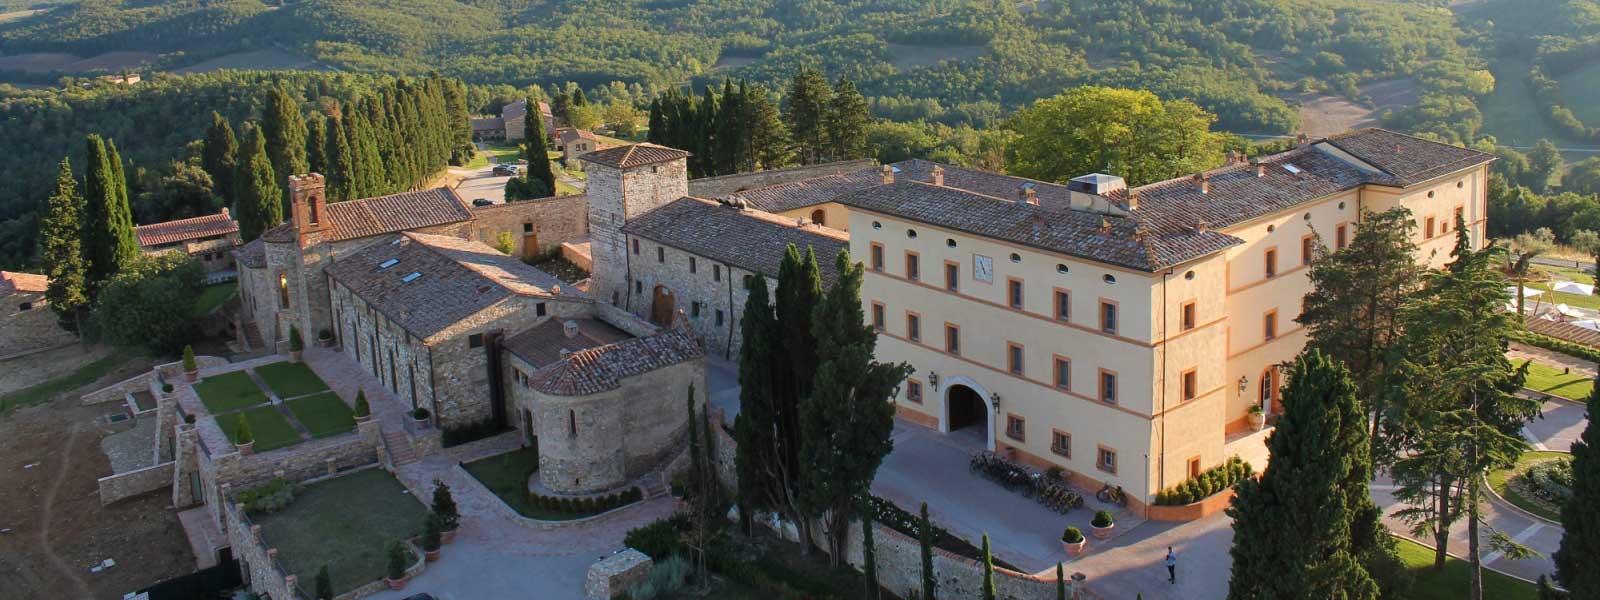 castello-di-casole-dal-hot-air-ballooning